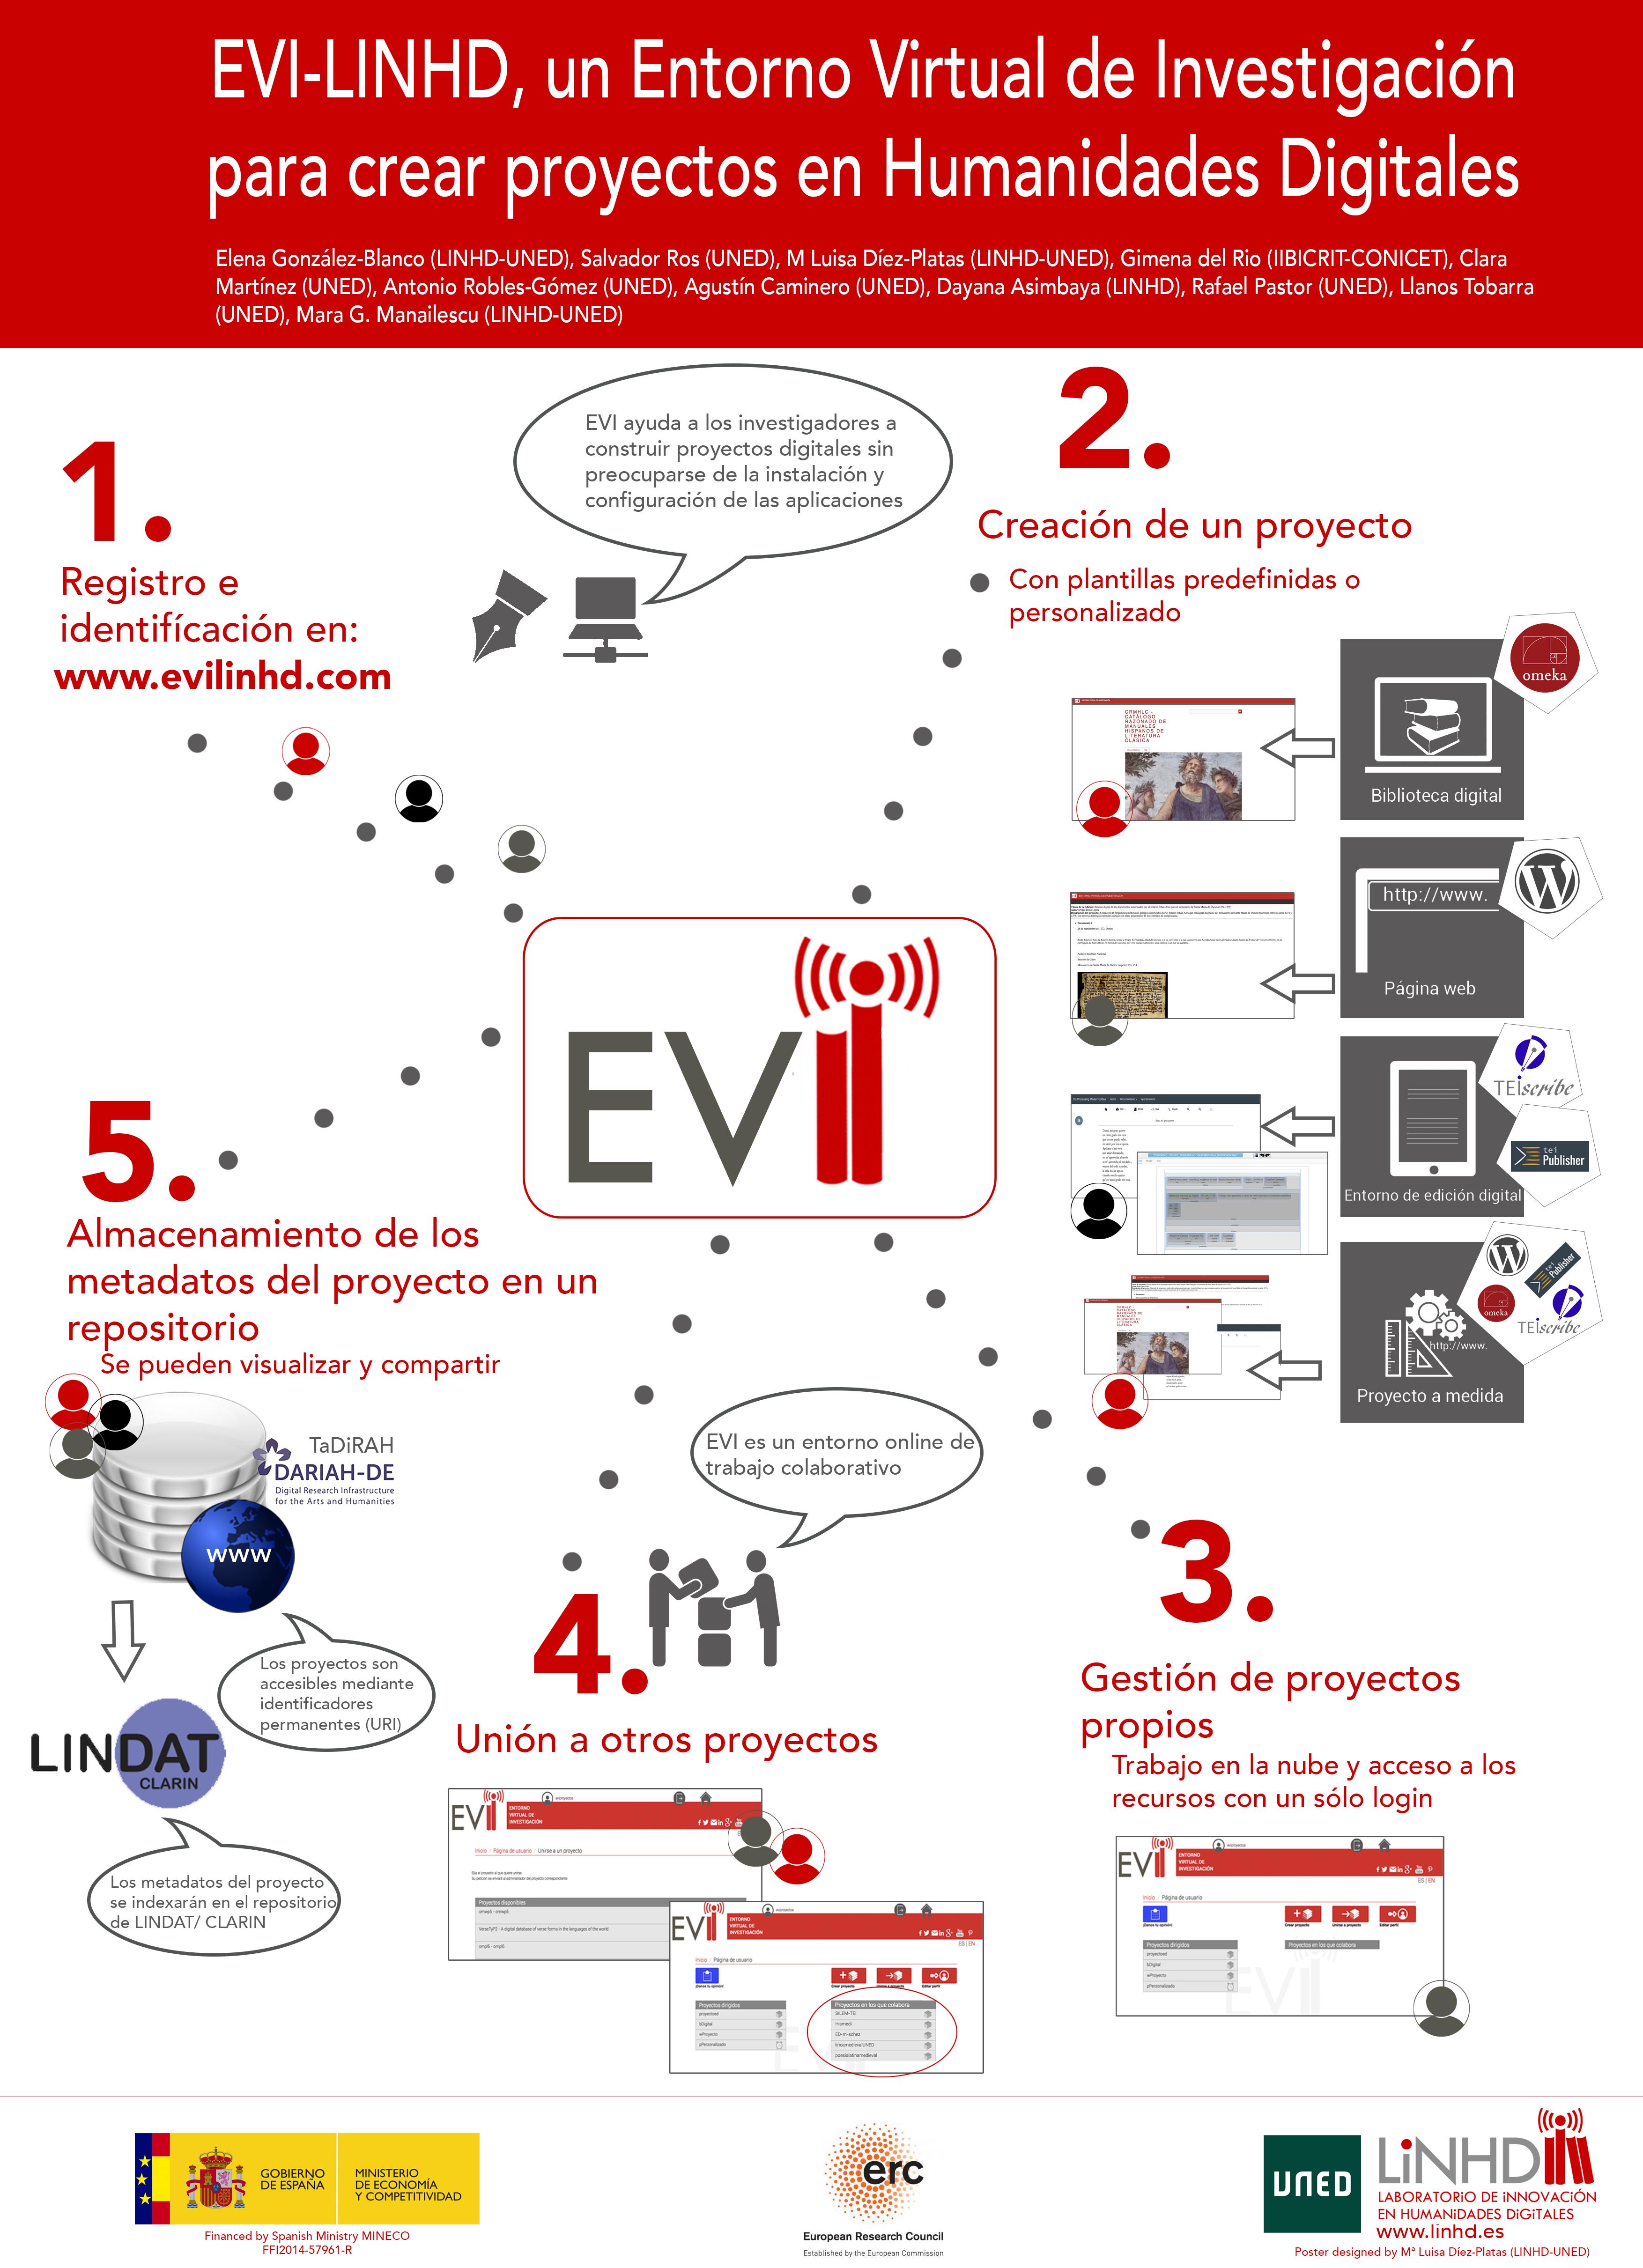 EVI-LINHD – Entorno Virtual de Investigación para Humanistas Digital